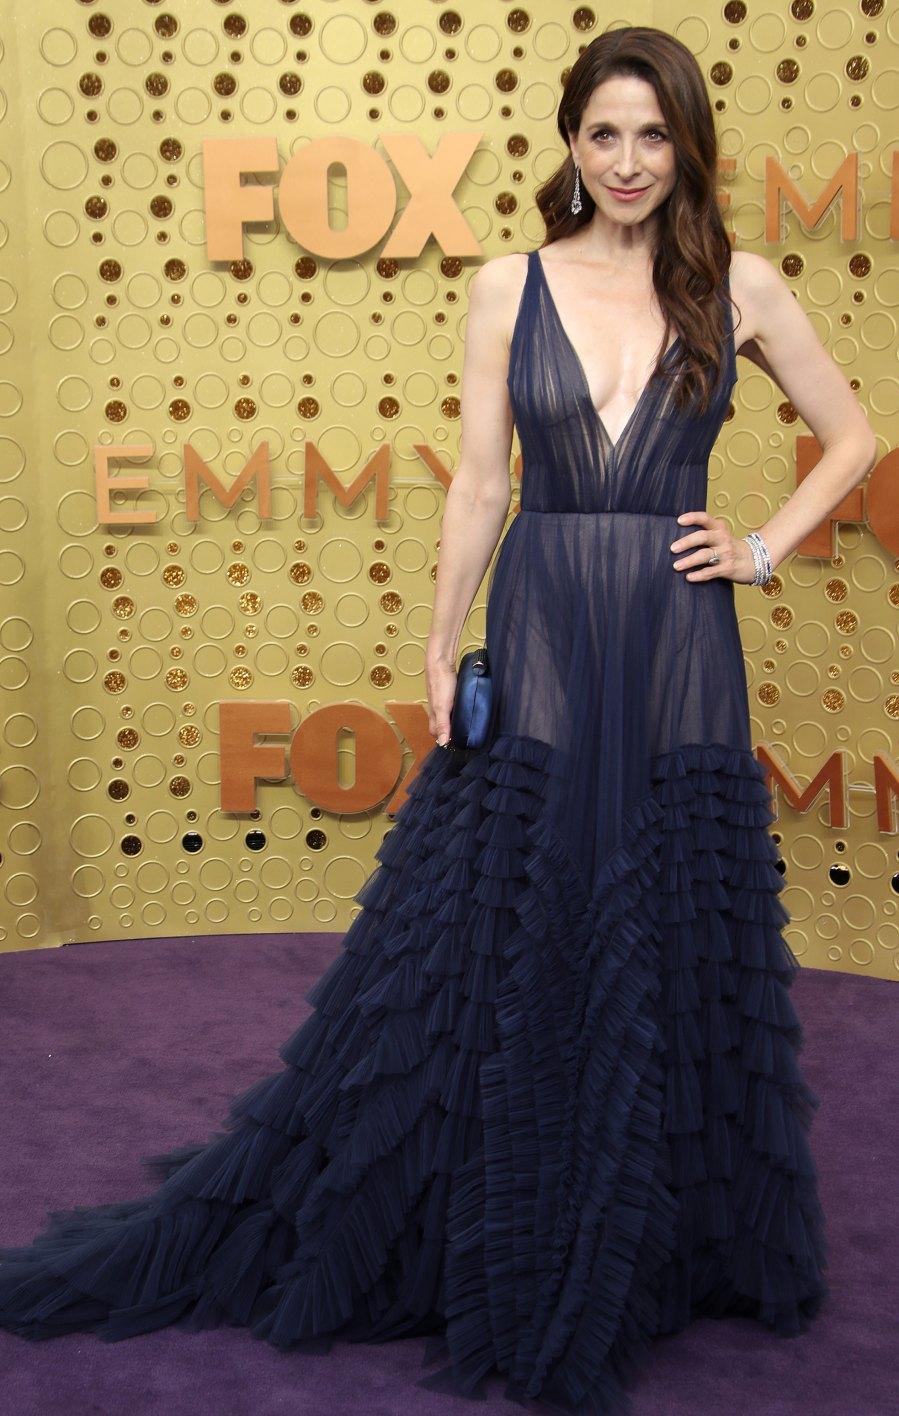 Emmys 2019 Nearly Naked - Marin Hinkle